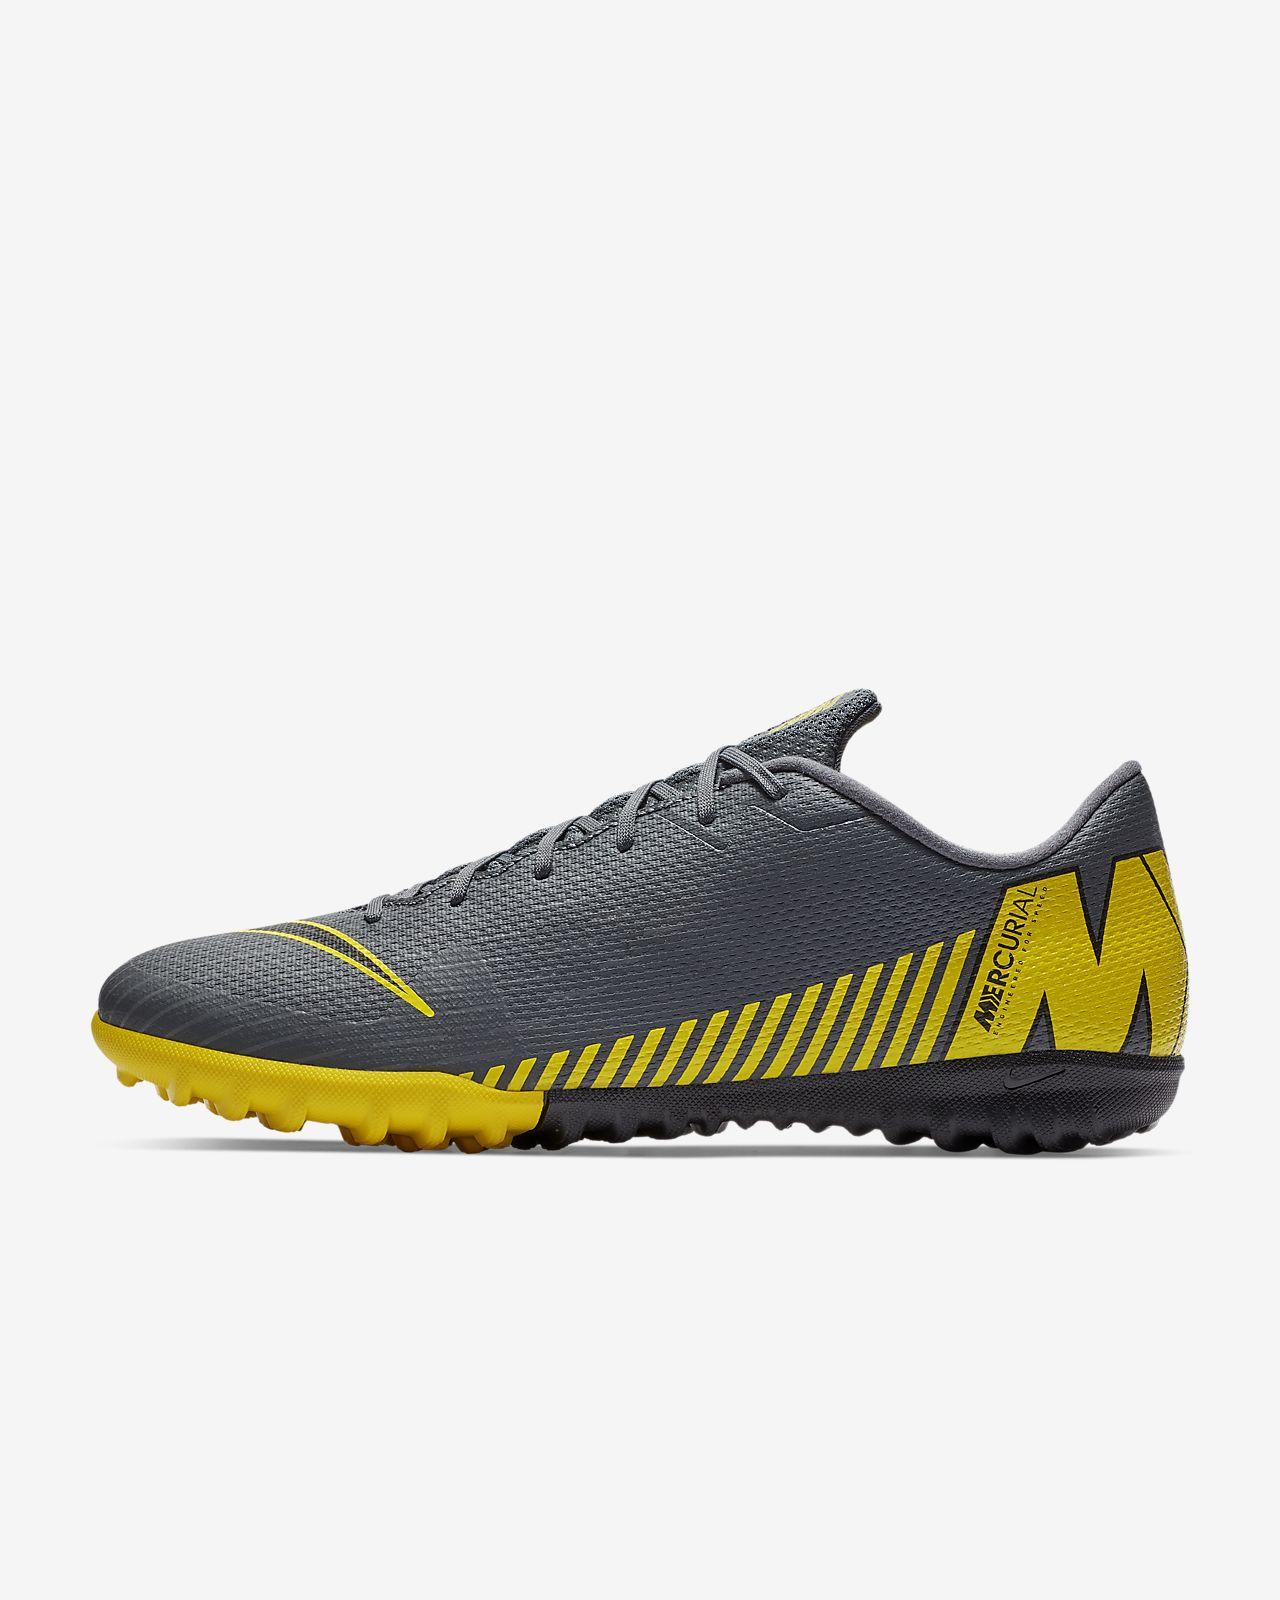 Nike Vaporx Da Erba Per Artificialesintetica 12 Scarpa Calcio Fn7CPgqg